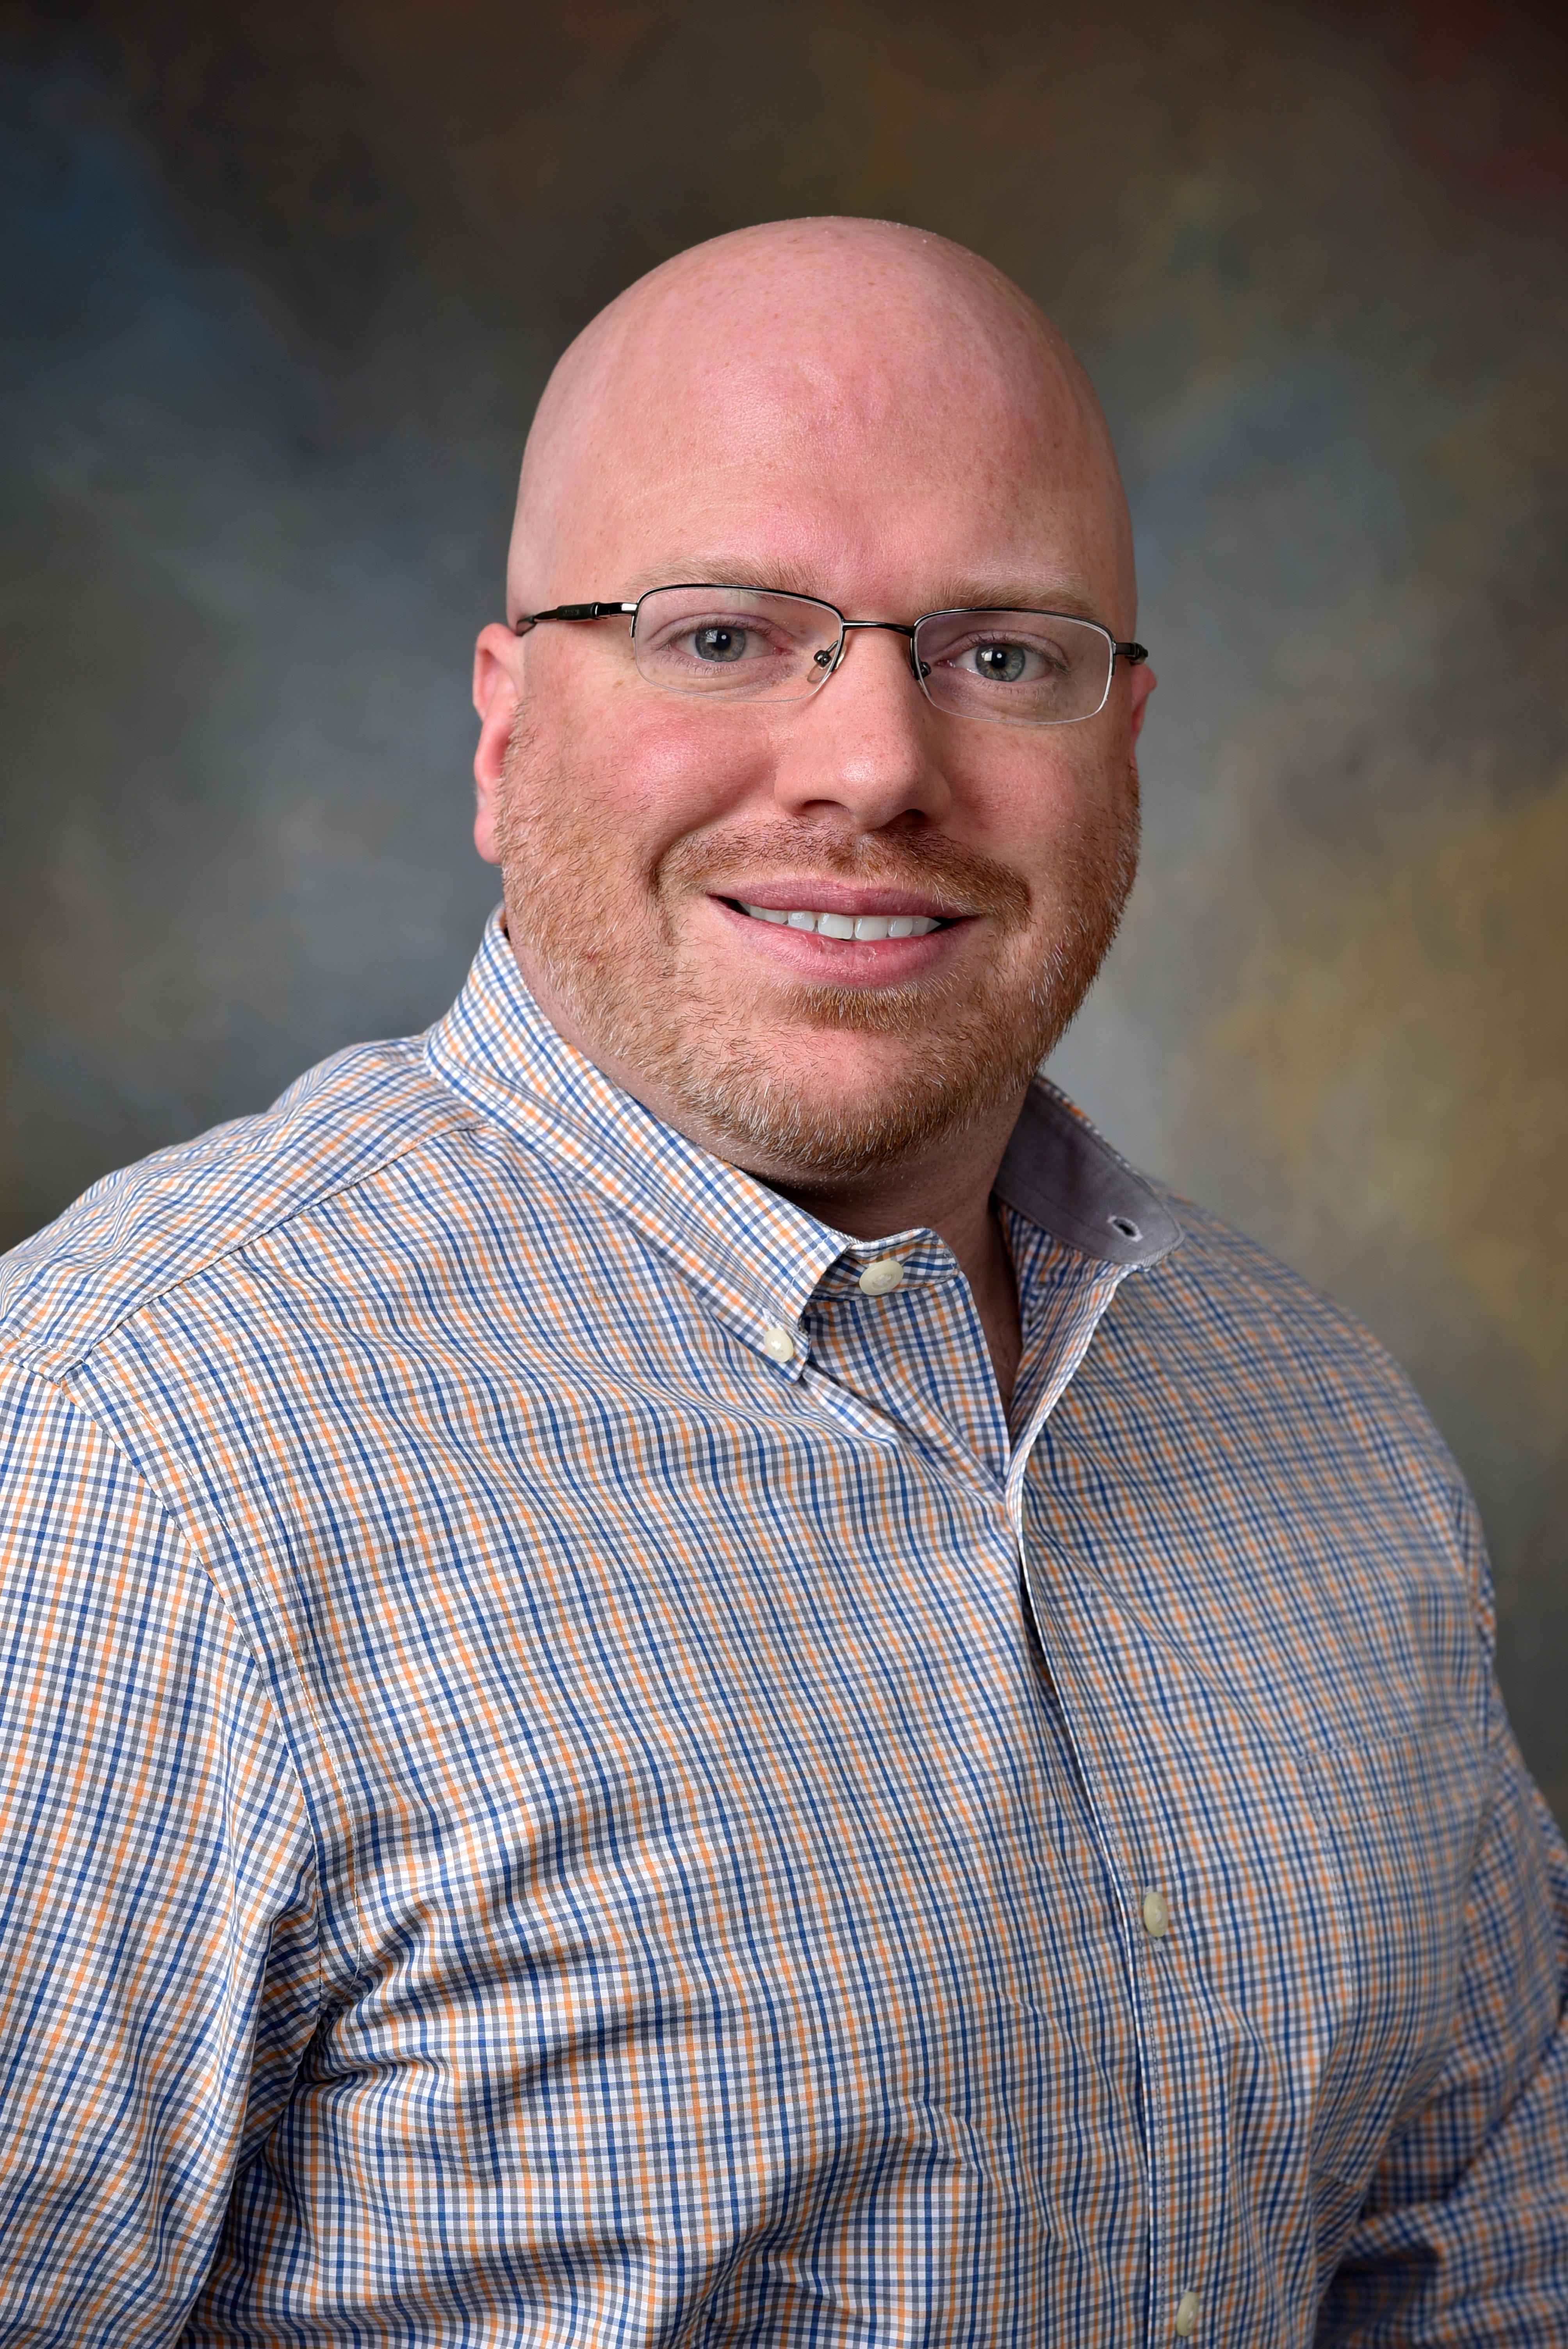 Daniel Sansobrino, MD